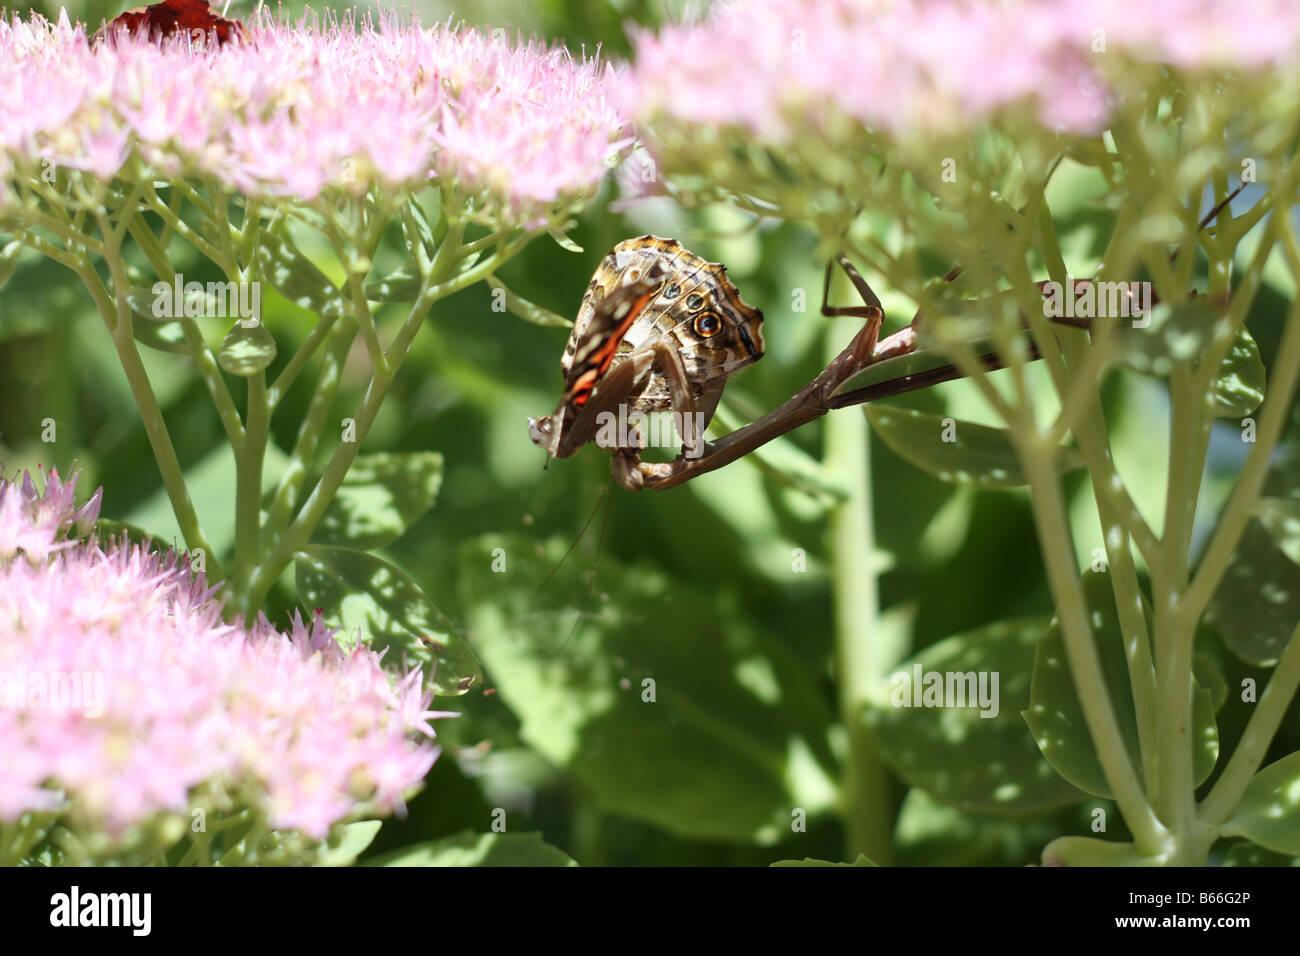 Preying mantis feeding. - Stock Image